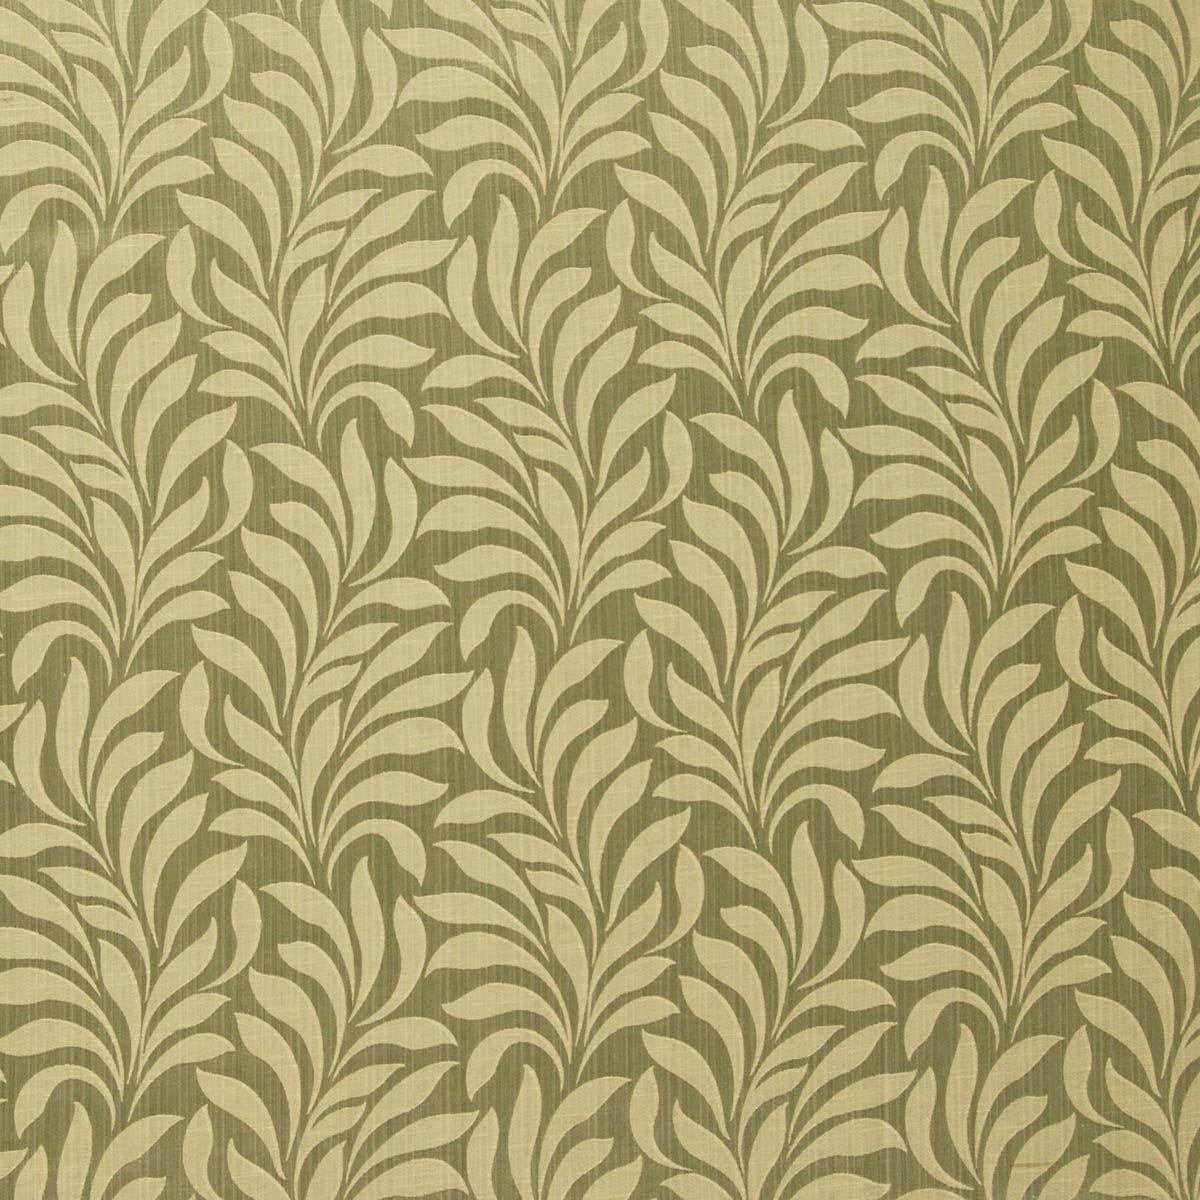 Bronte-Fabric-Sage.jpg (JPEG Image, 1200×1200 pixels) - Scaled (58%)